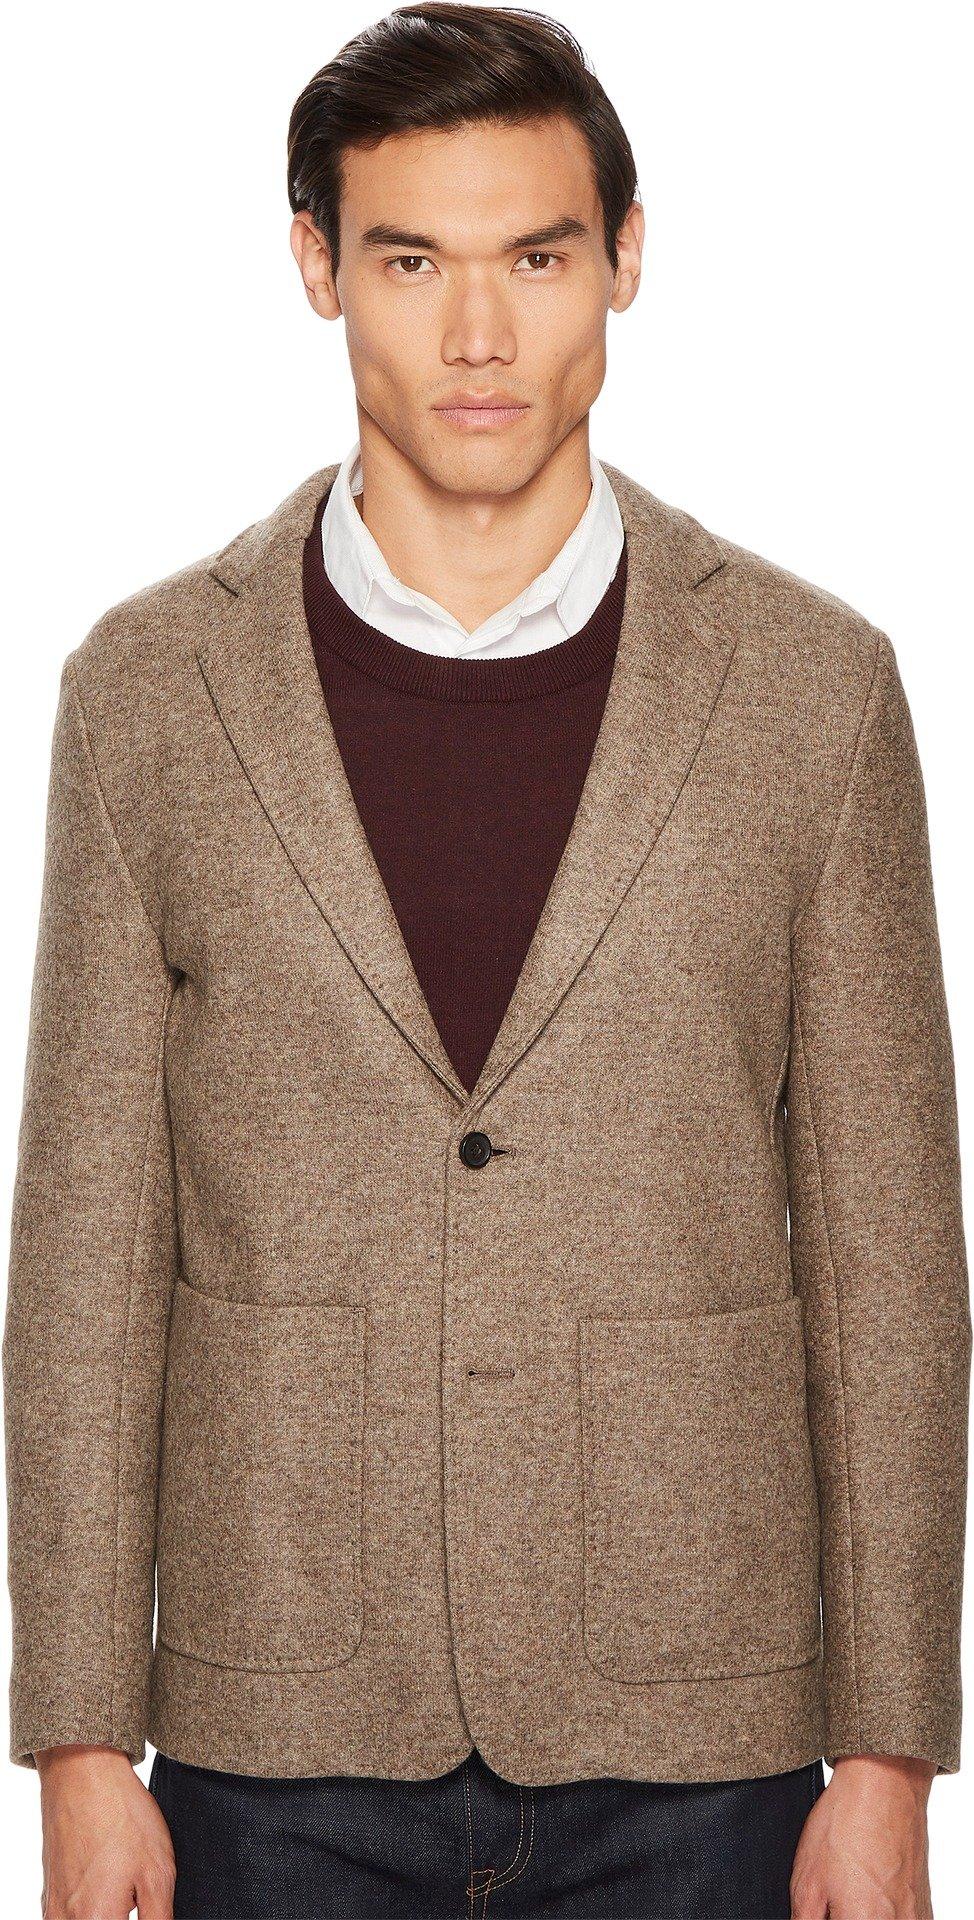 Billy Reid Men's Dylan Sportcoat Taupe 42 Regular